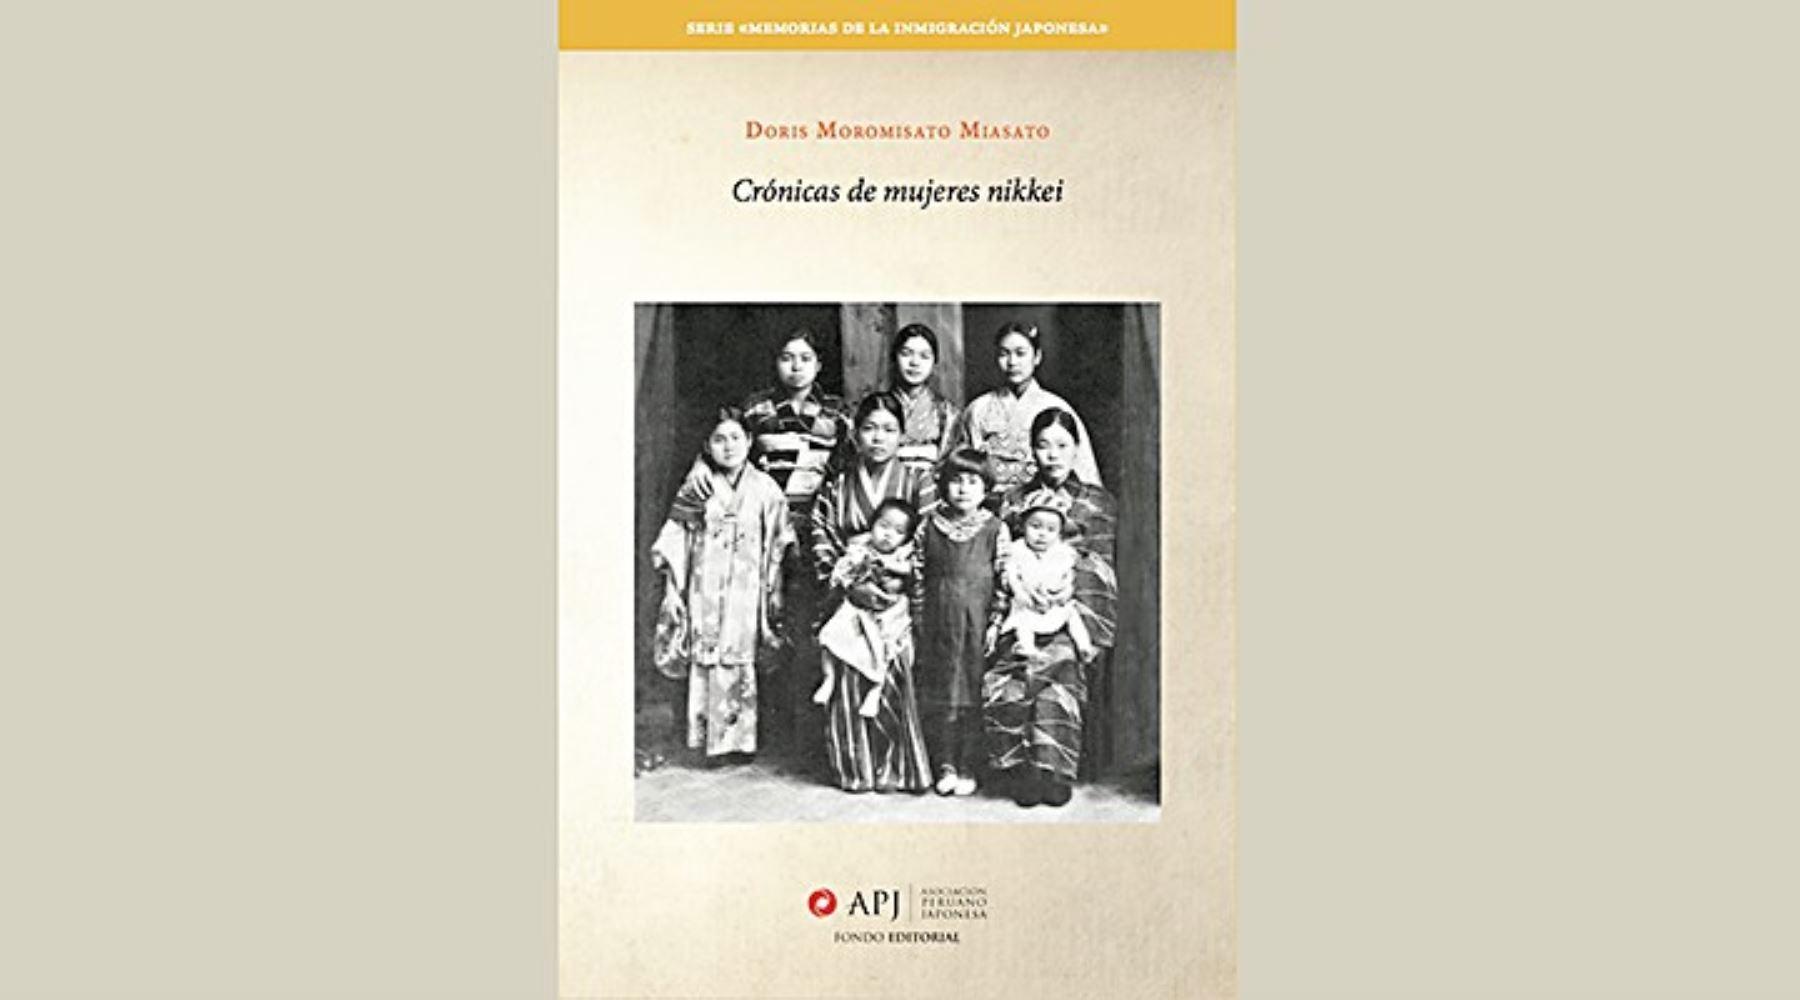 Portada del libro Crónicas de mujeres nikkei de Doris Moromisato.